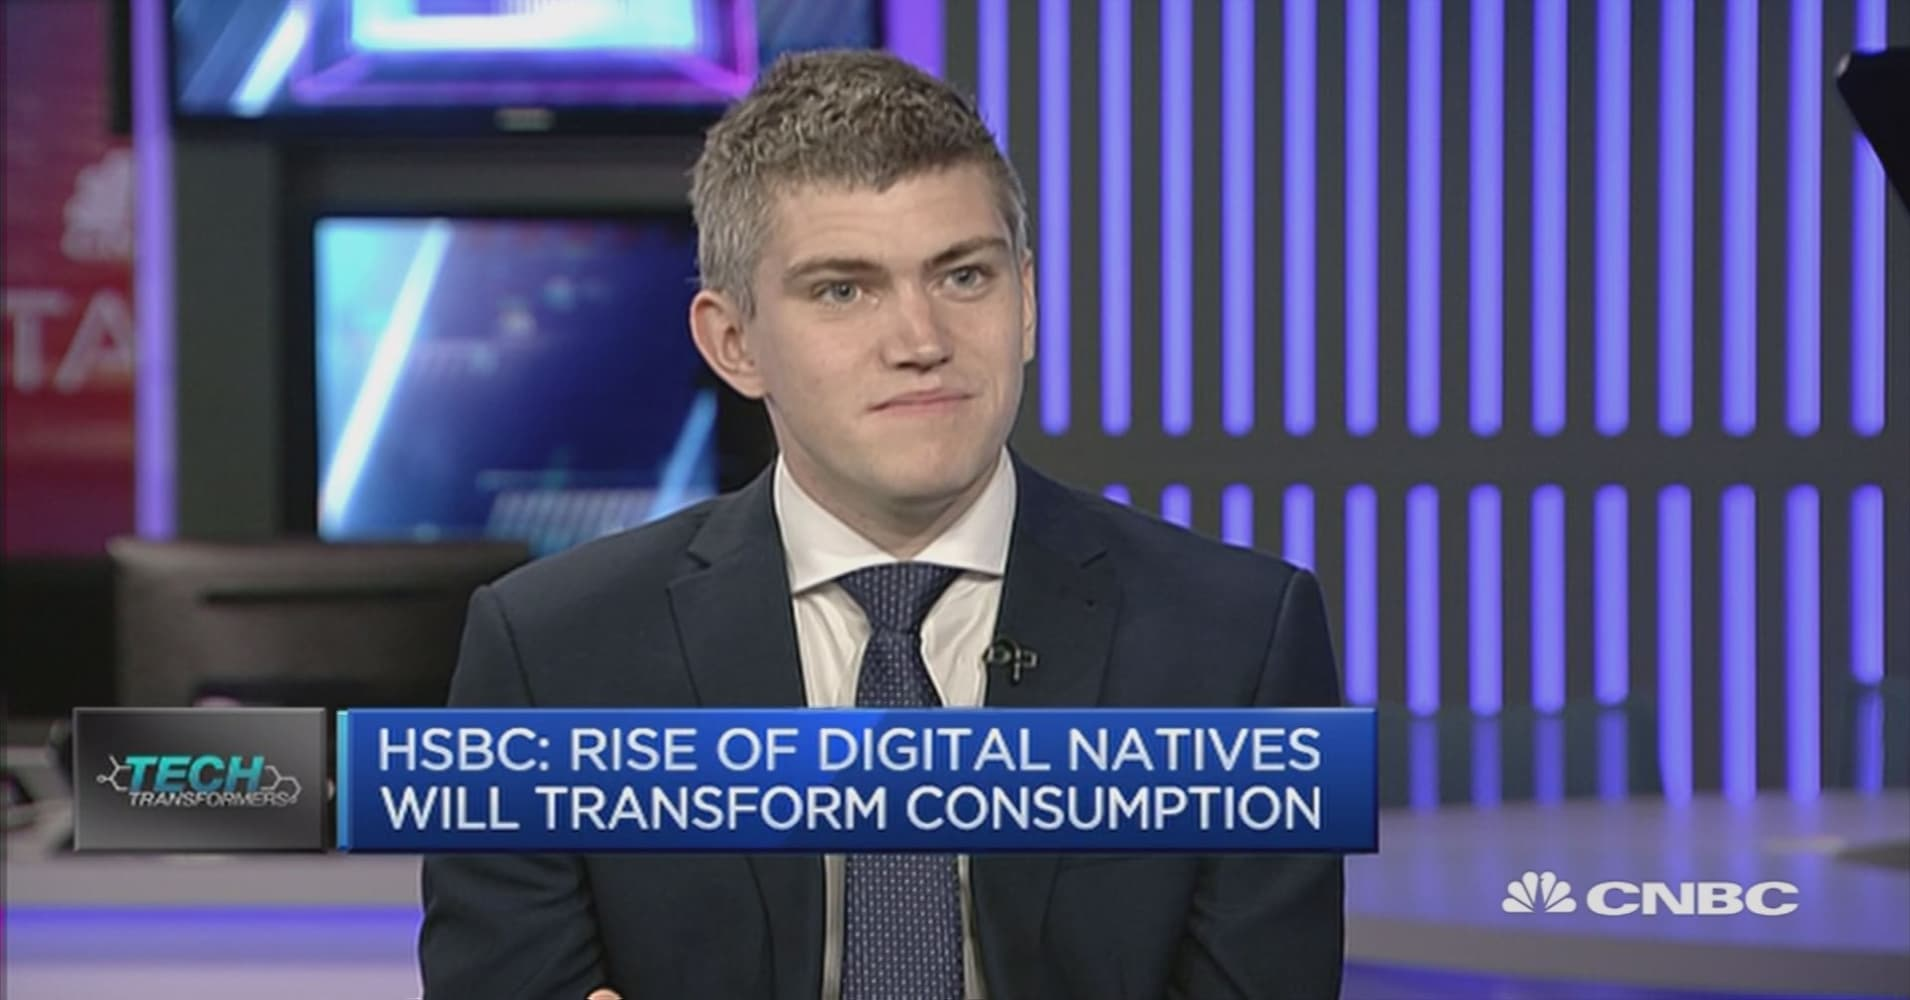 Digital natives will transform consumption: HSBC